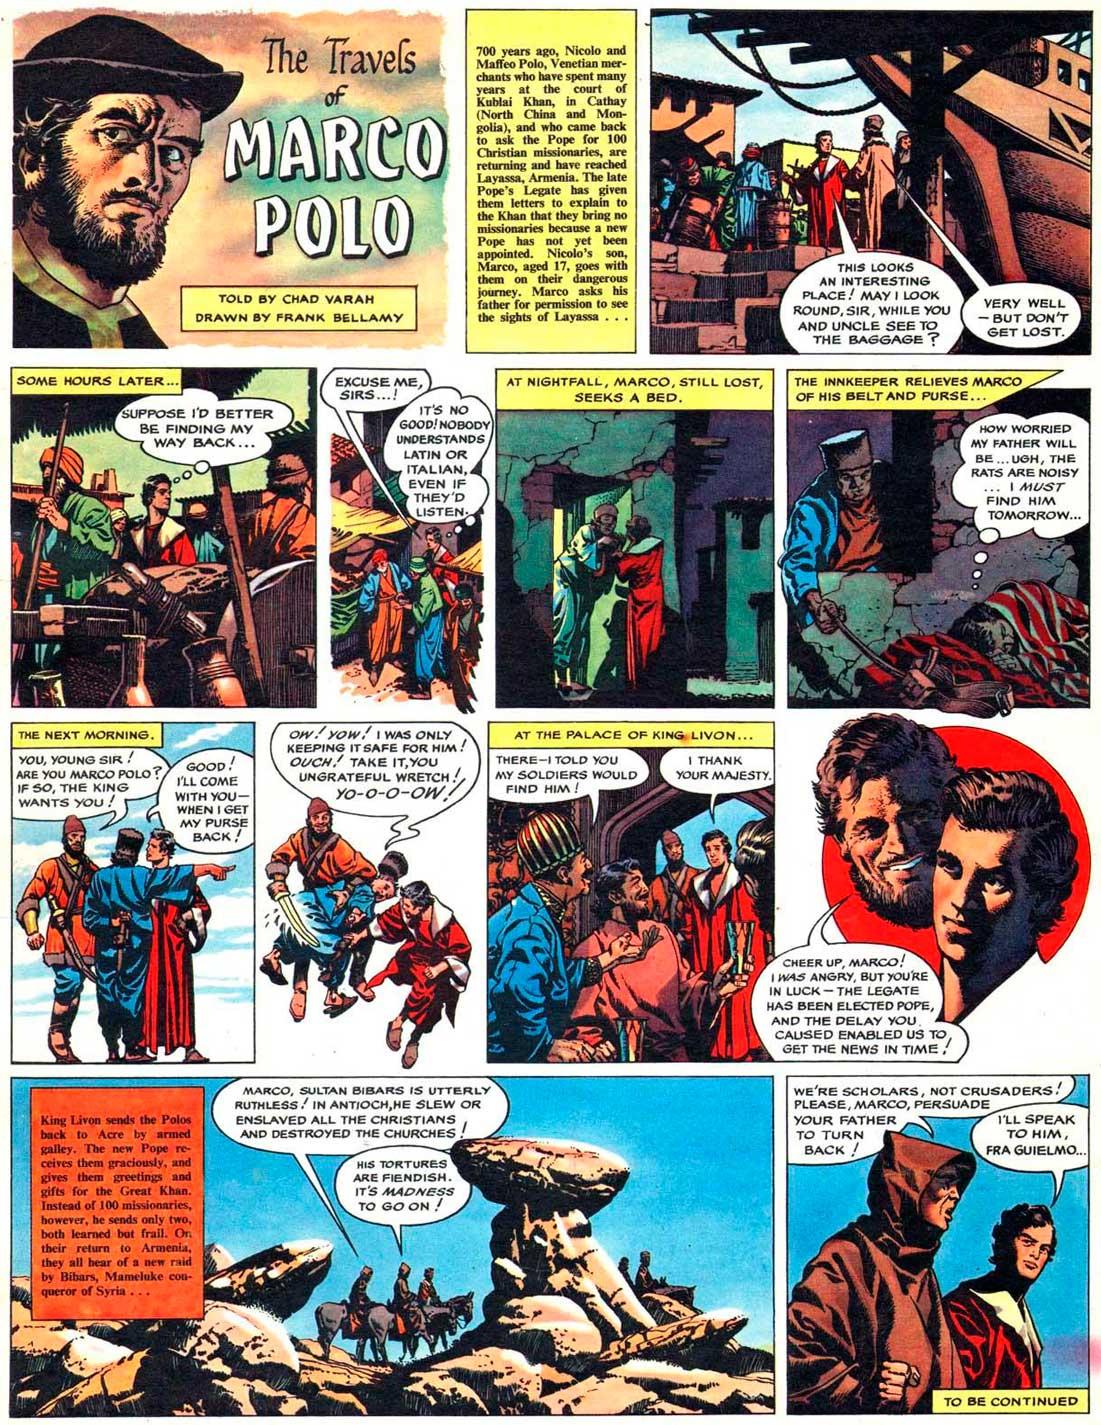 La version originale des « Voyages de Marco Polo » par Frank Bellamy.